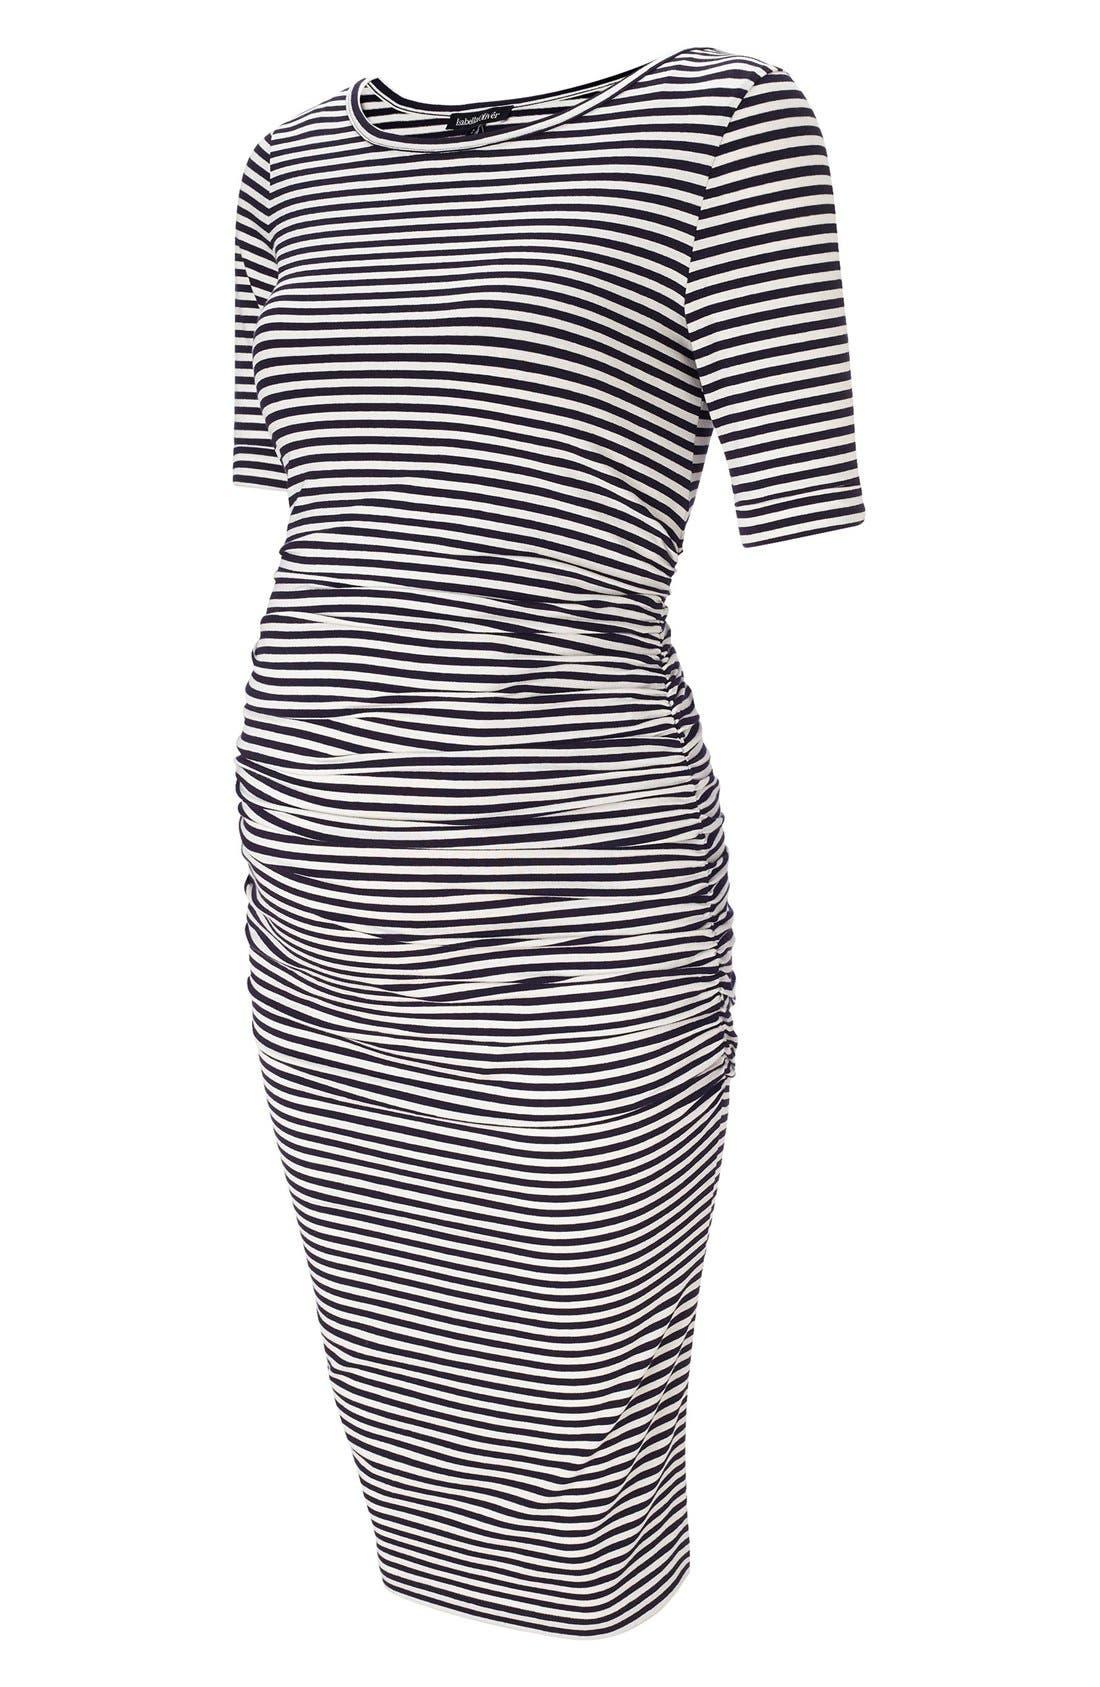 Main Image - Isabella Oliver Arlington Stripe Maternity Dress